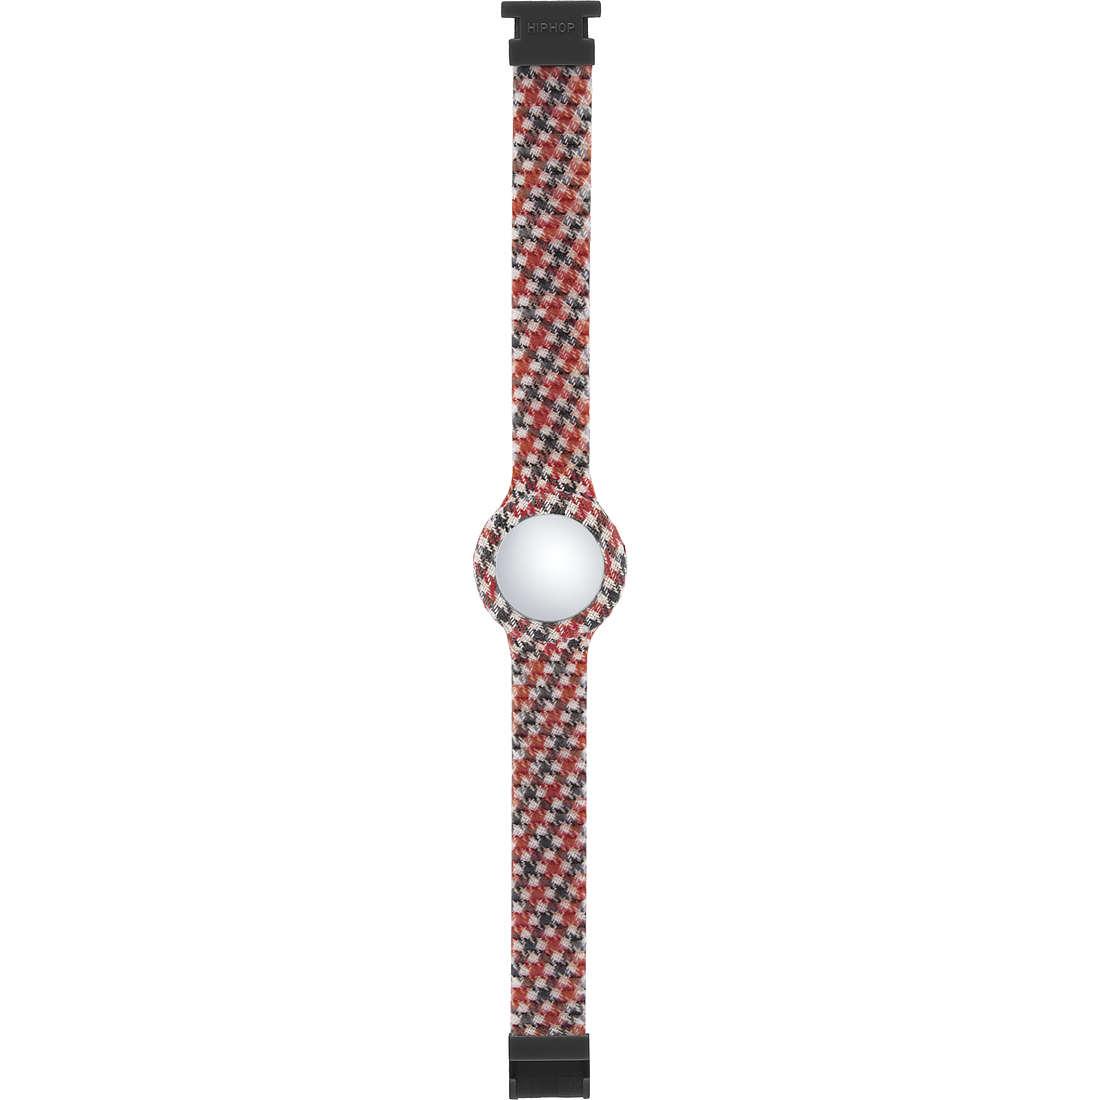 orologio accessorio unisex Hip Hop Pied De Poule HBU0373